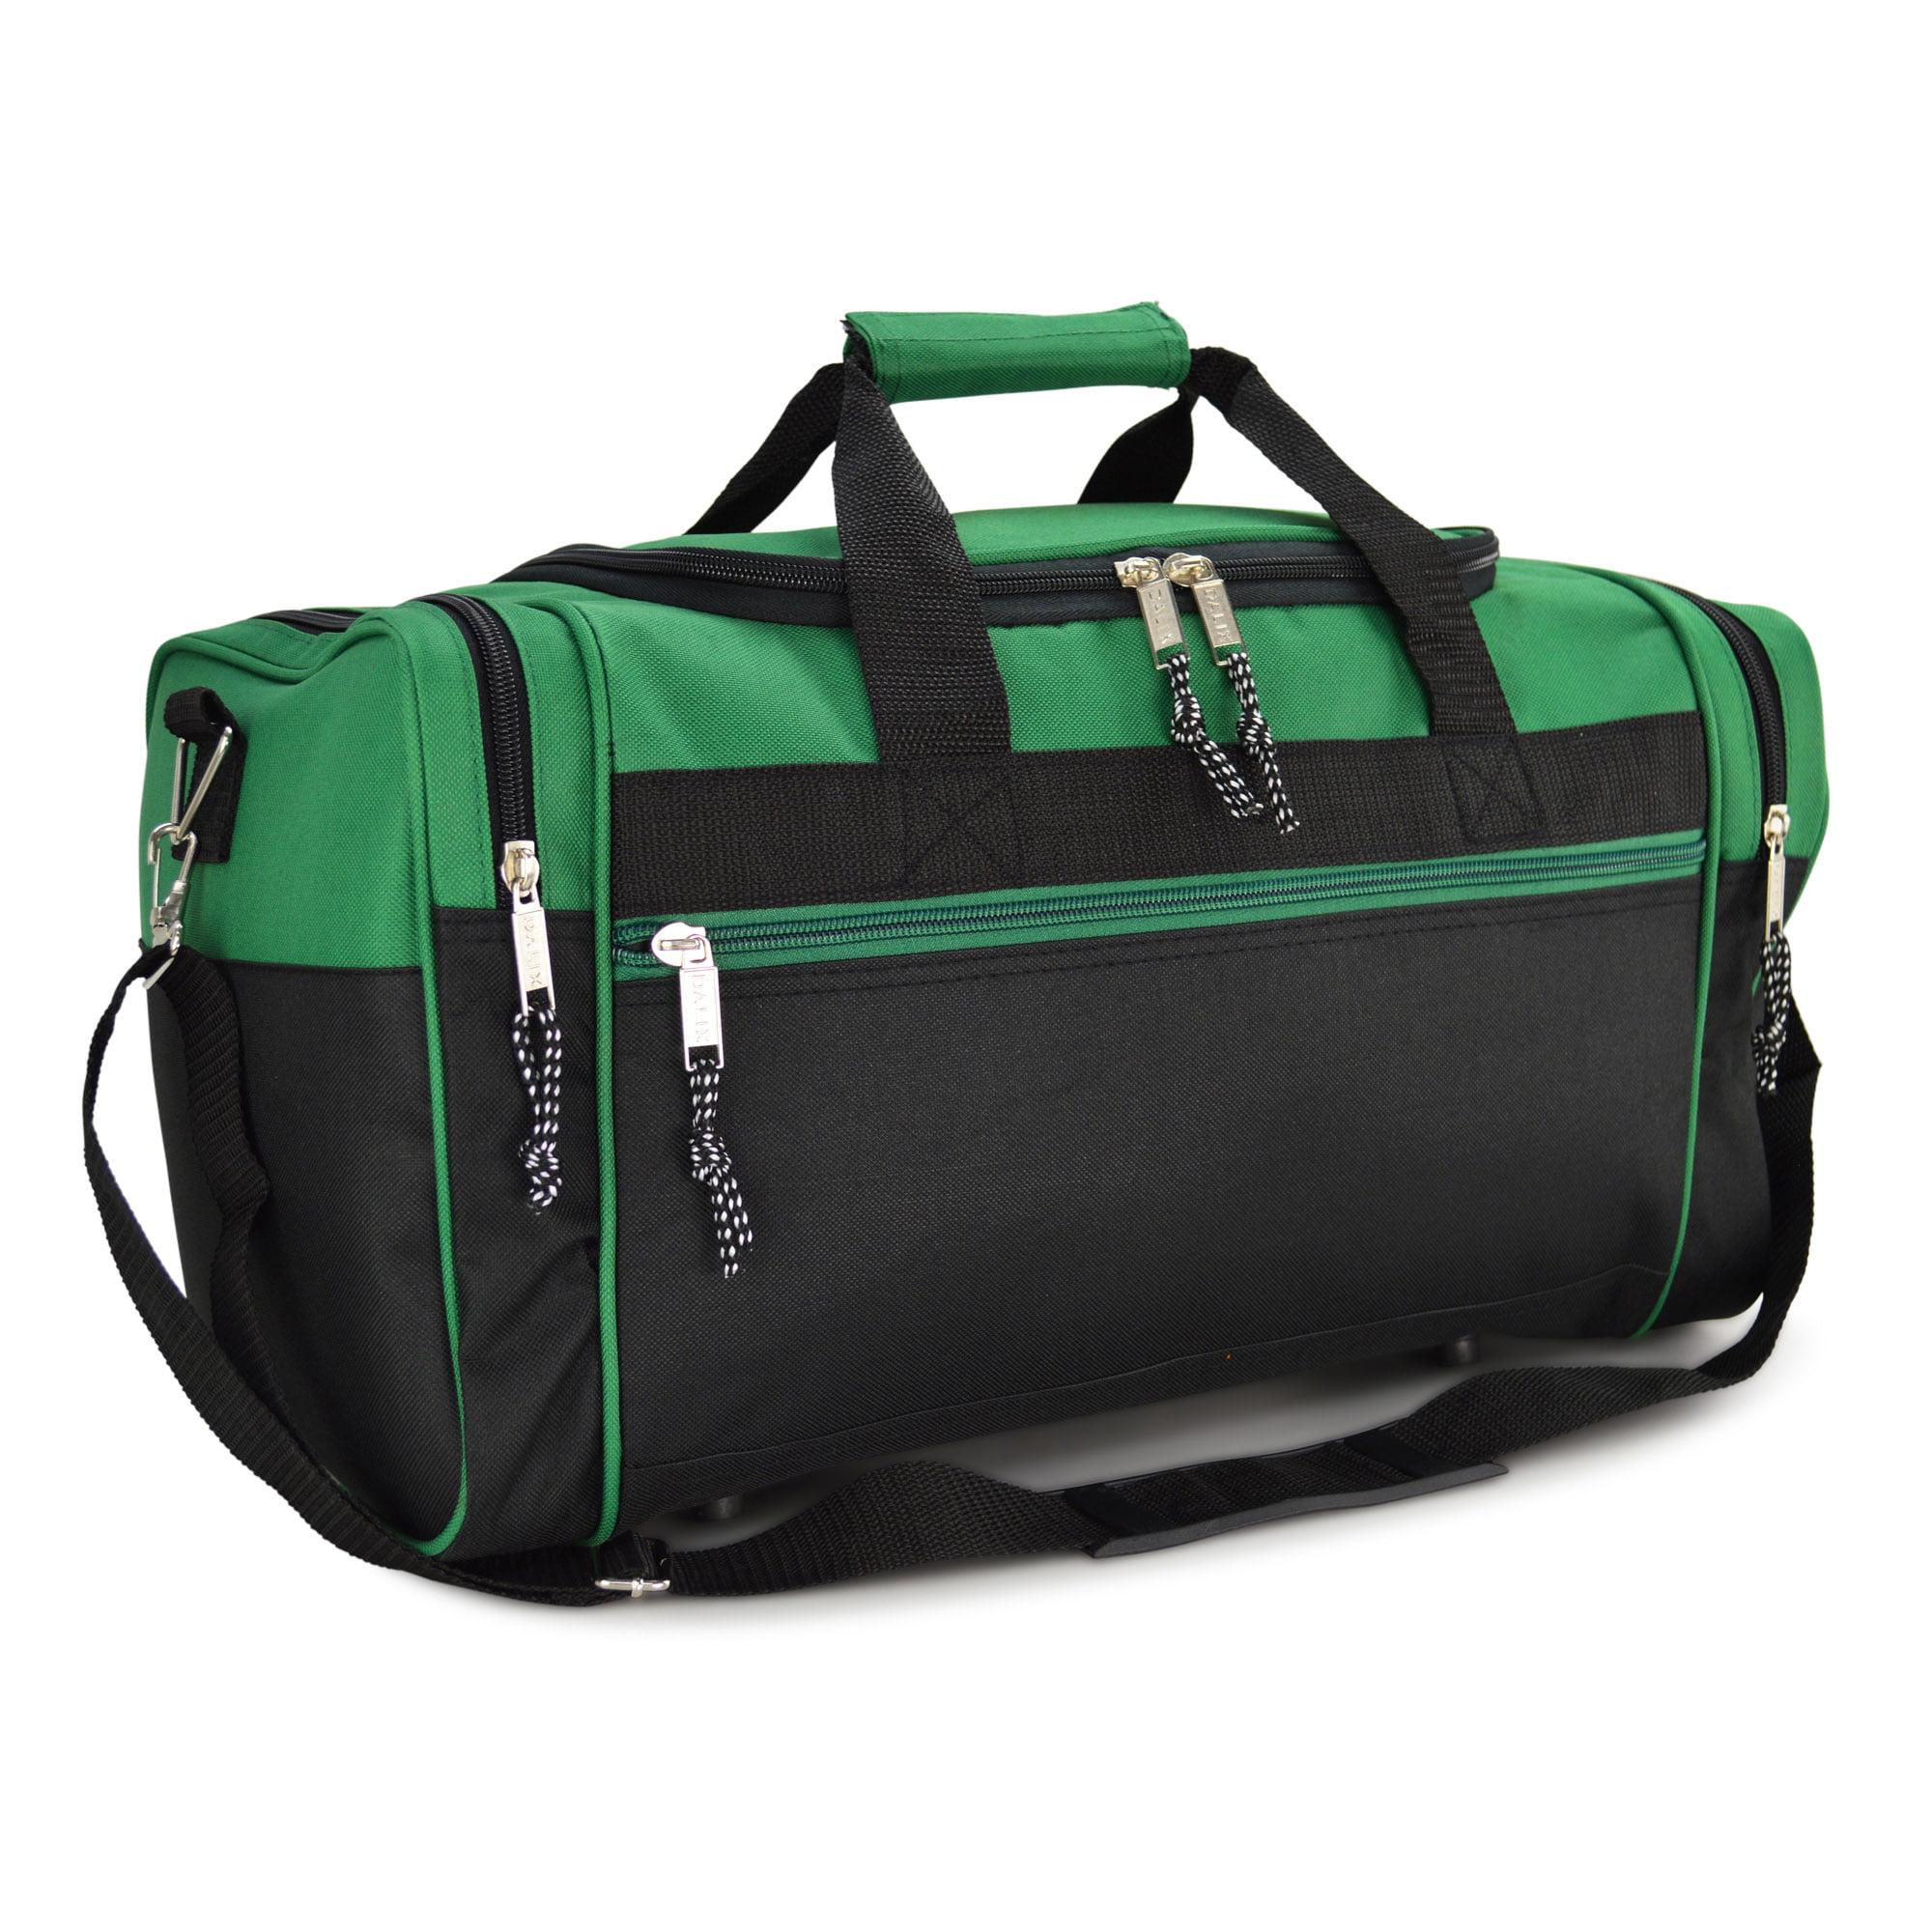 "DALIX 21"" Blank Sports Duffle Bag Gym Bag Travel Duffel with Adjustable Strap in Royal Blue"